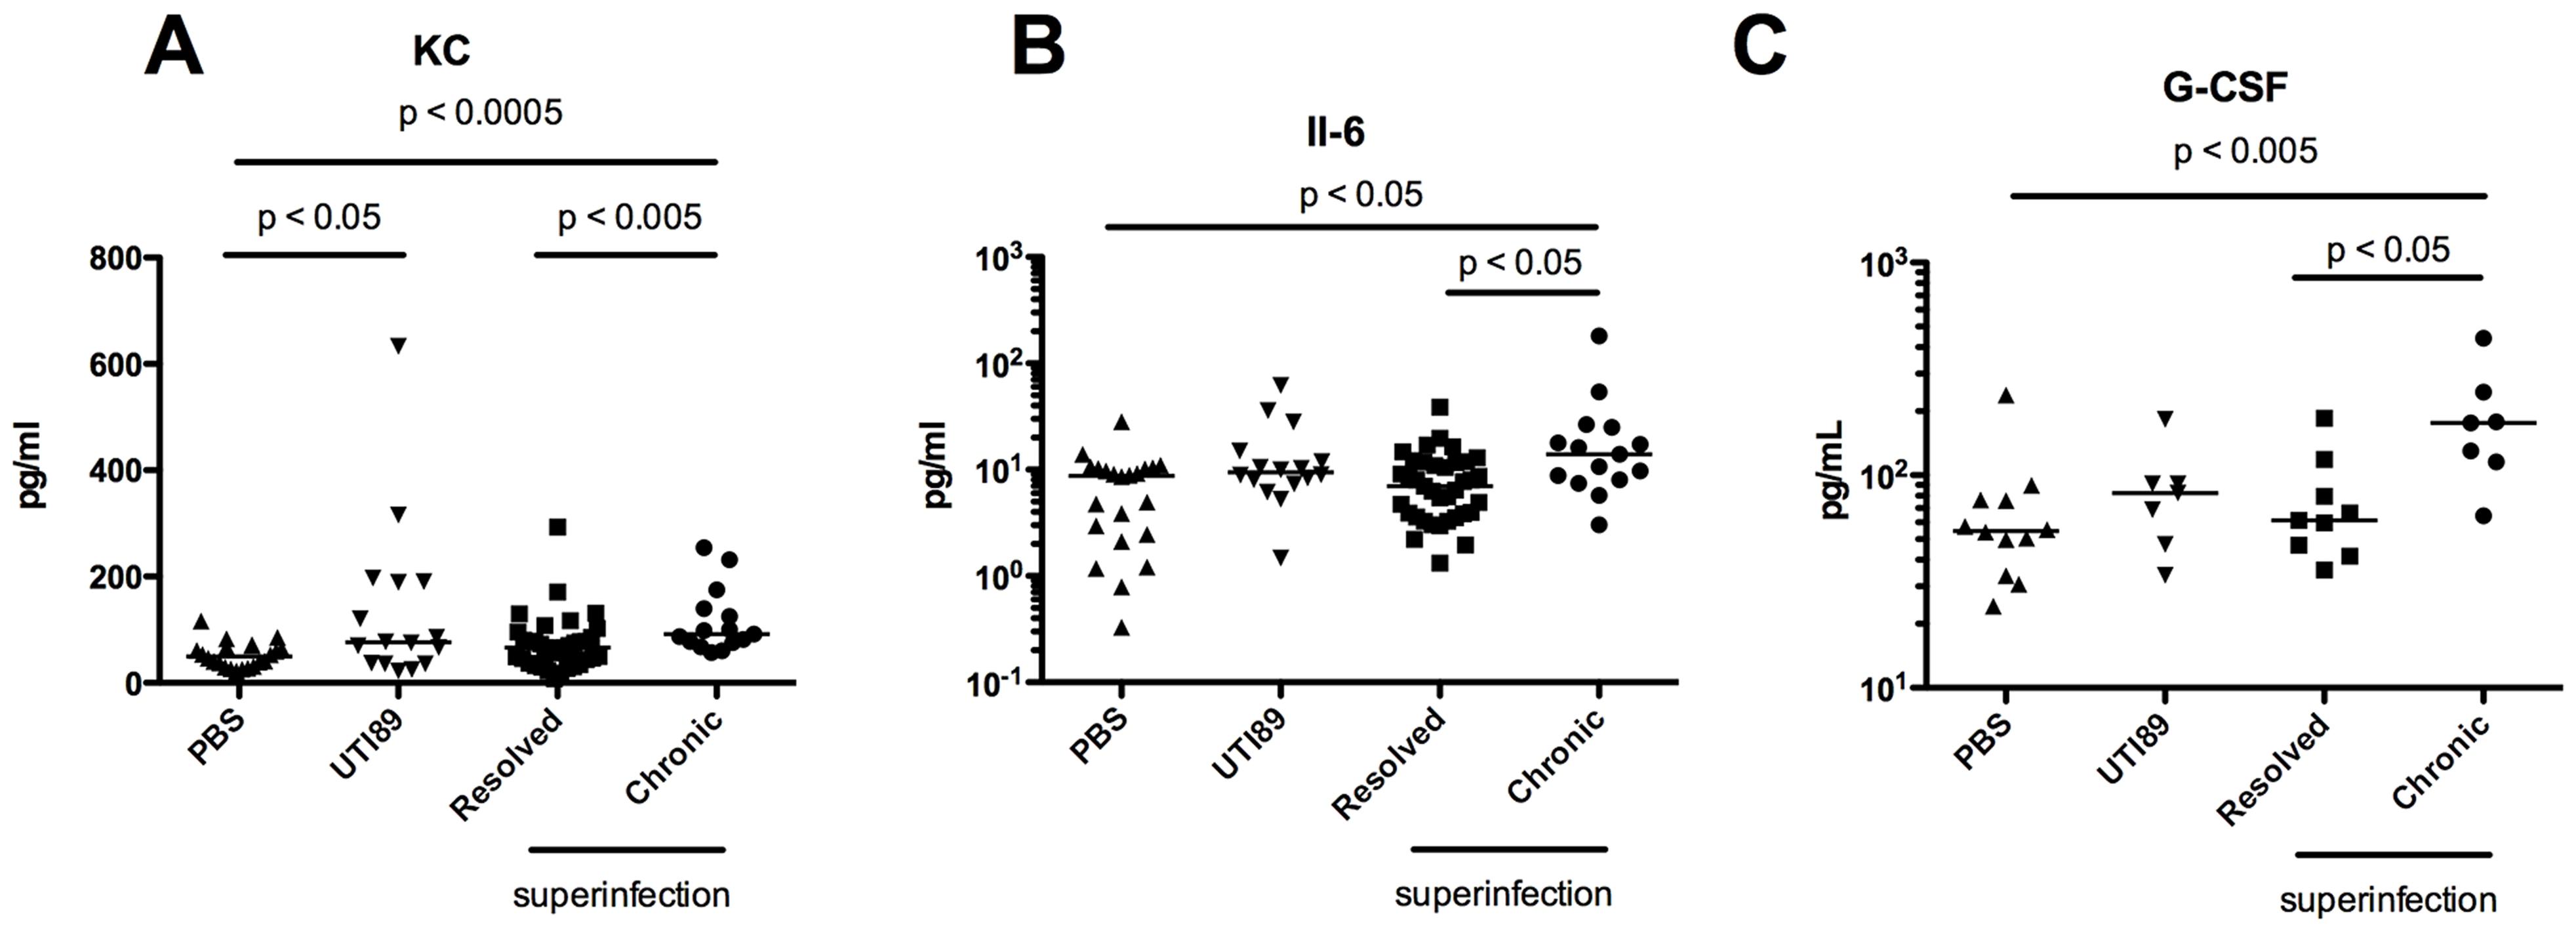 Serum cytokine signature of C57BL/6J mice with persistent bacteriuria.